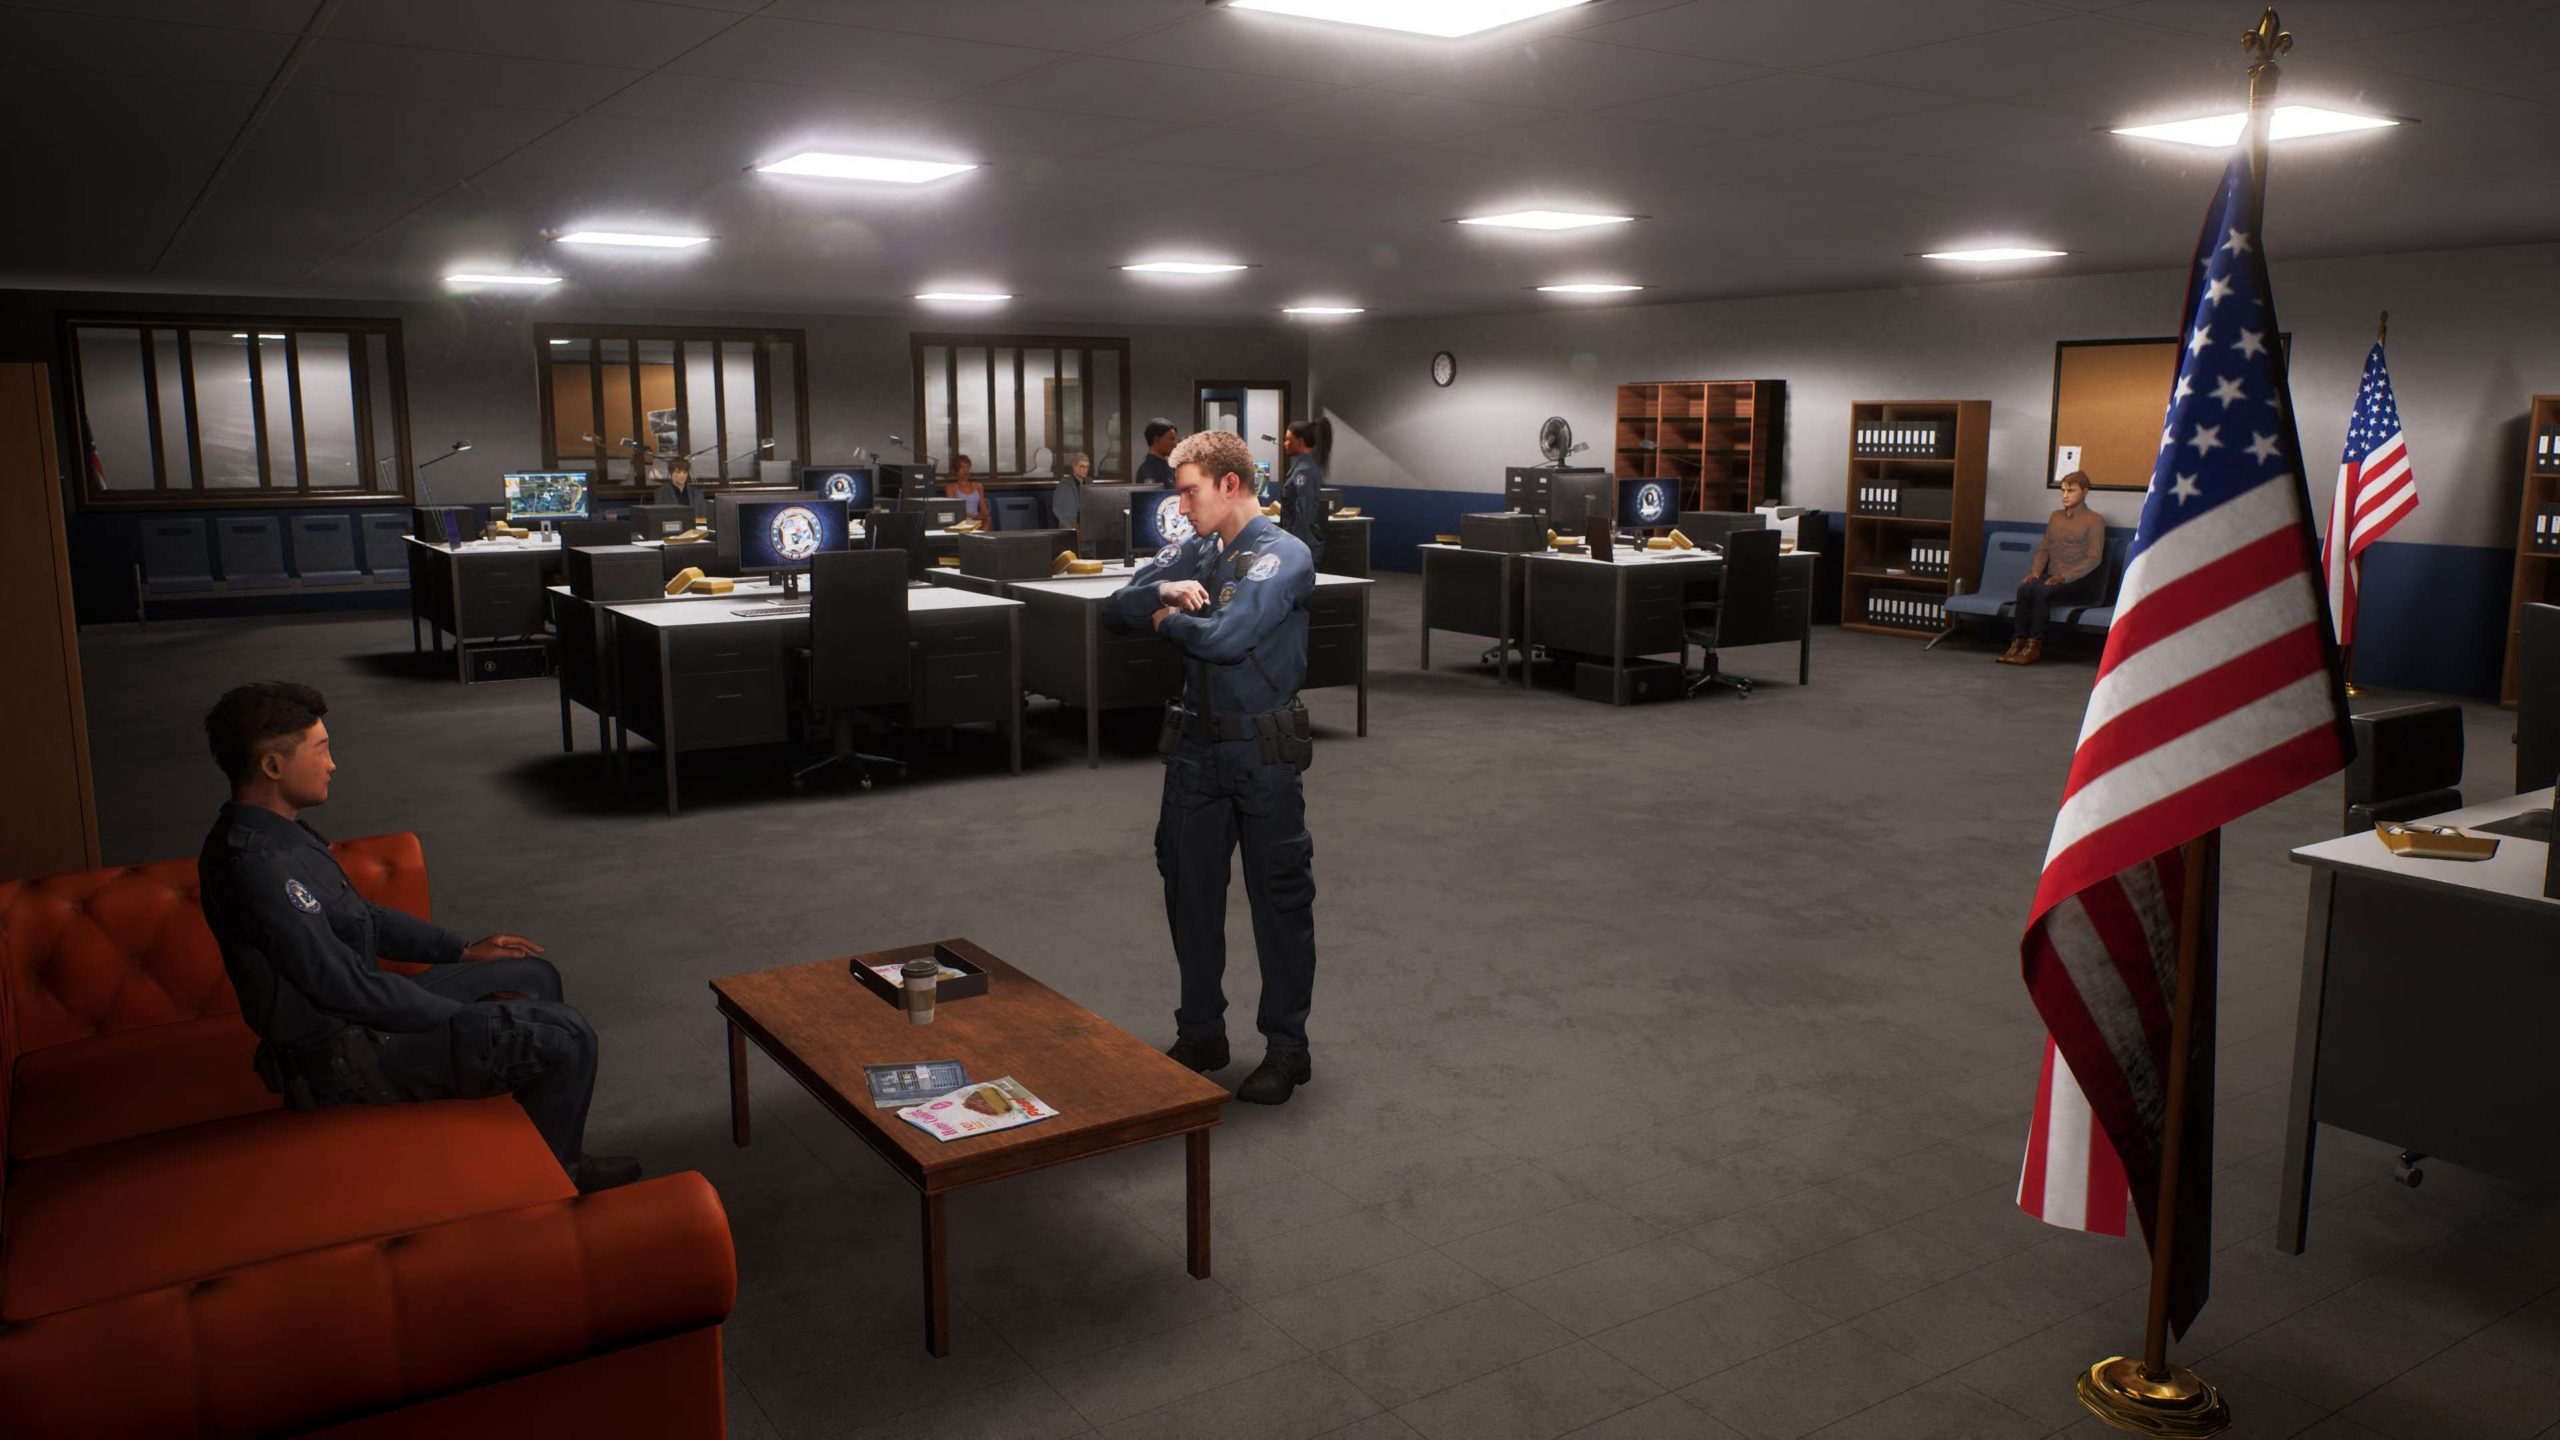 Police Simulator: Patrol Officers | astragon, Aesir Interactive